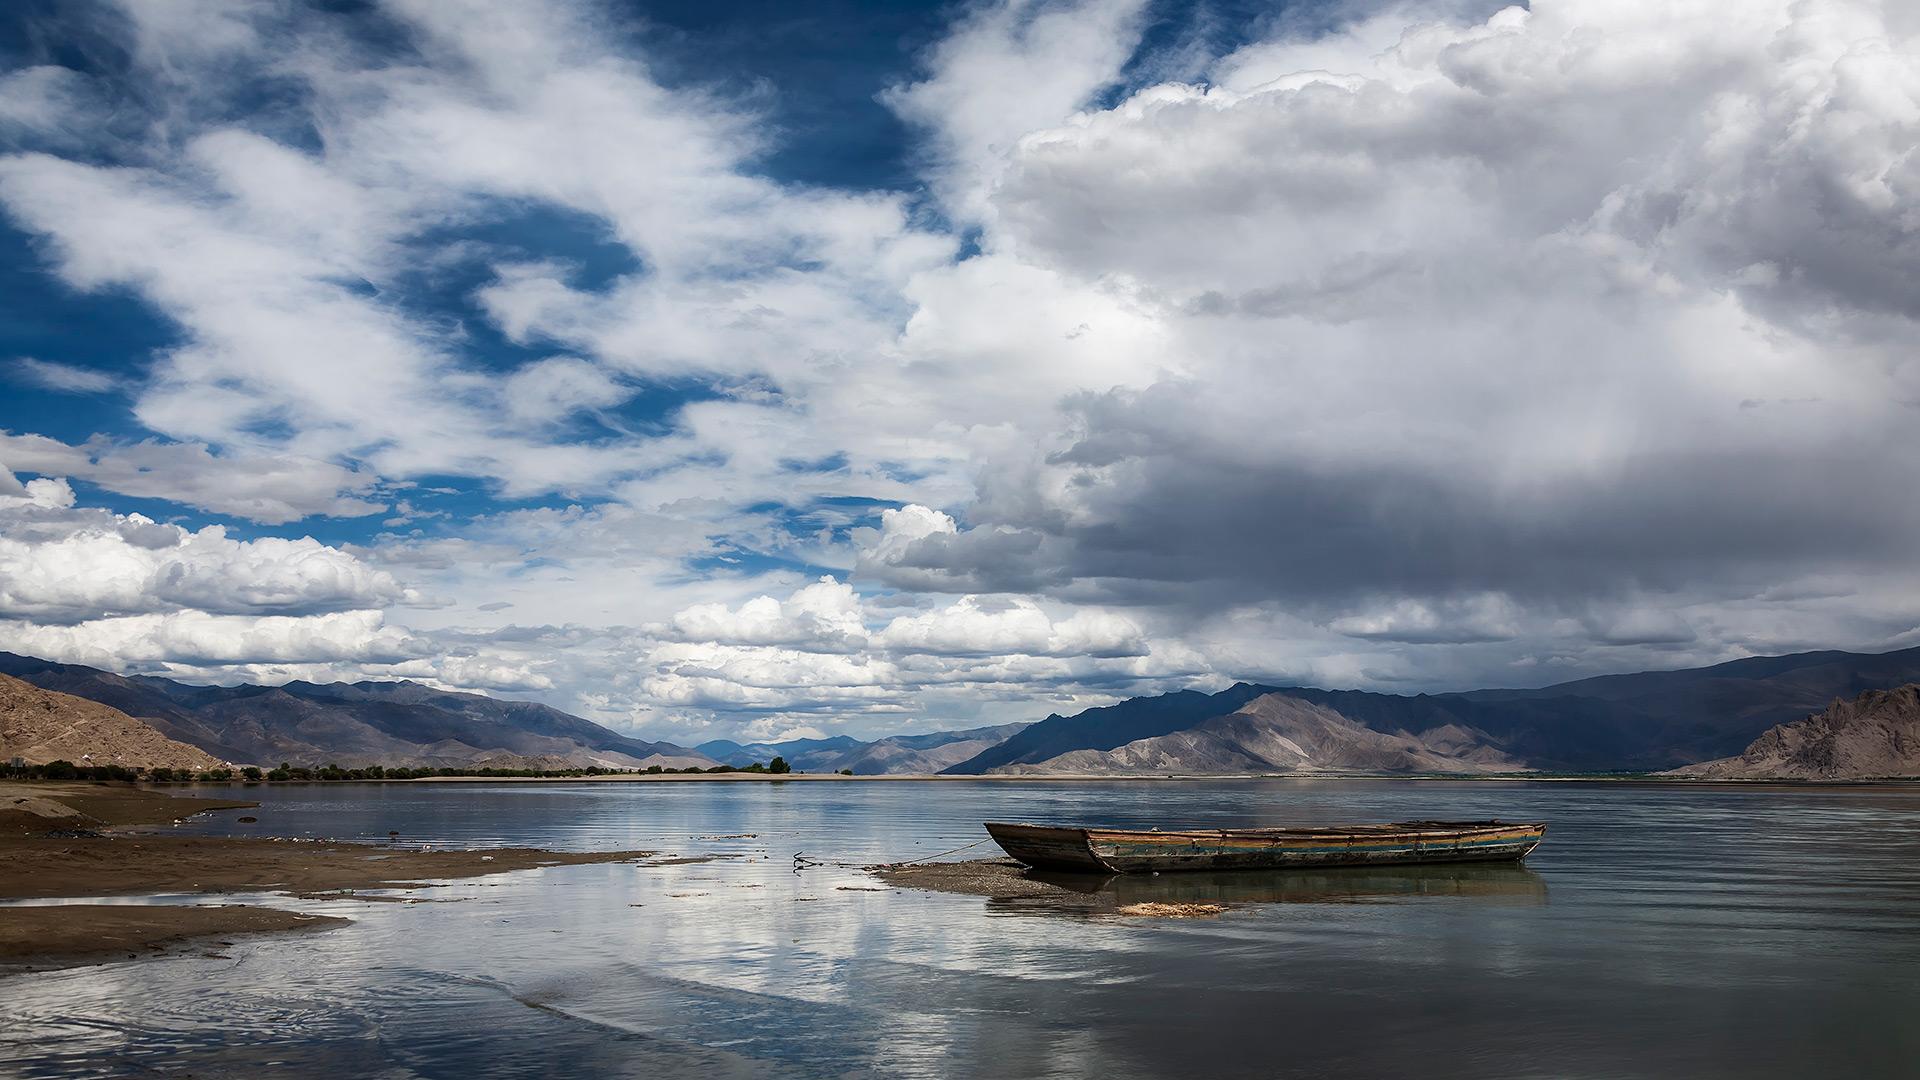 Yarlung Tsangpo. Samye, Tibet